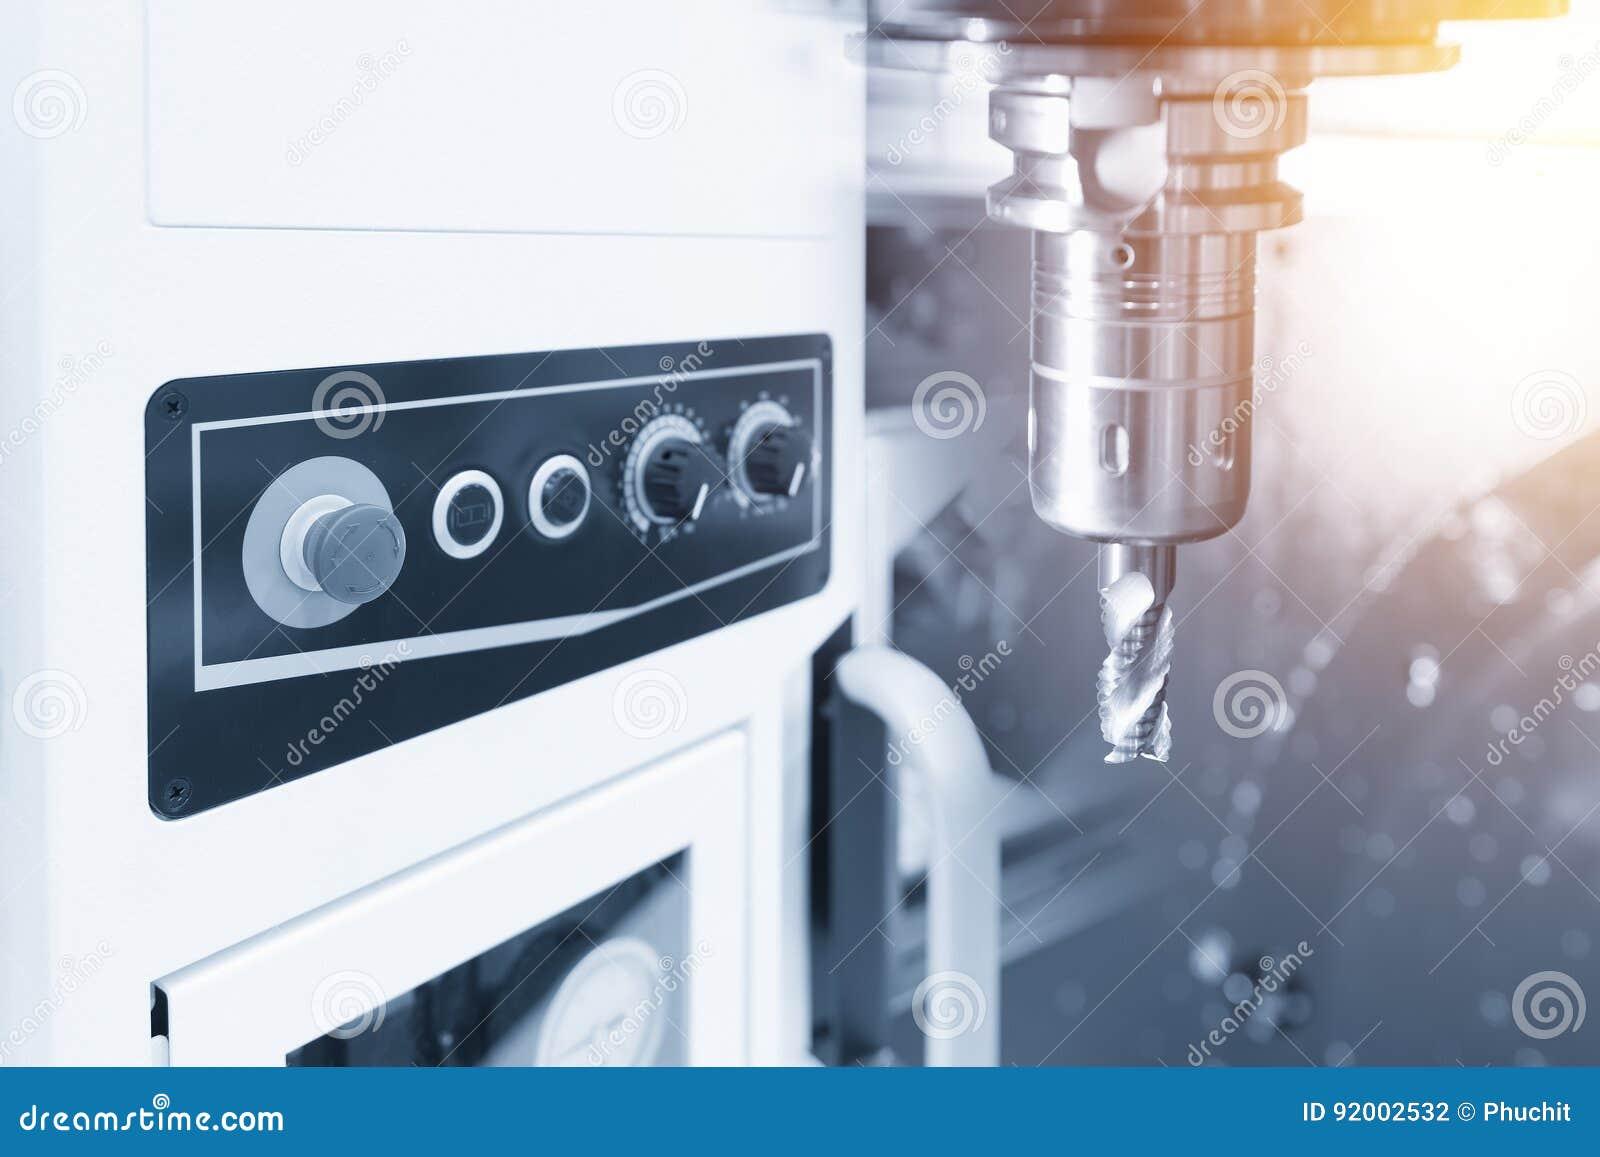 The CNC milling machine stock photo  Image of holder - 92002532